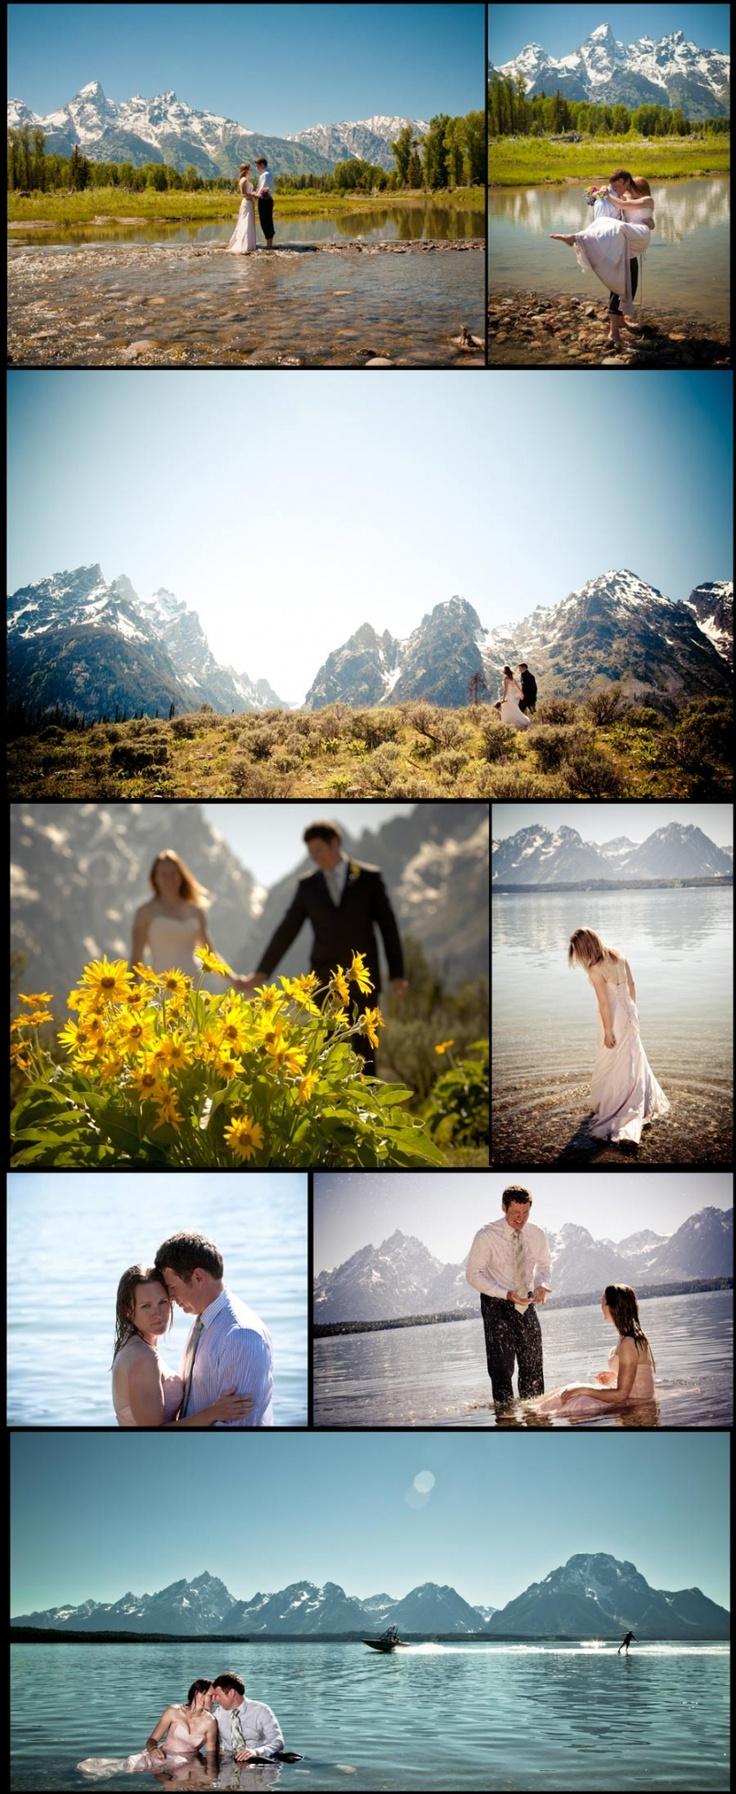 17 best images about jackson hole weddings on pinterest